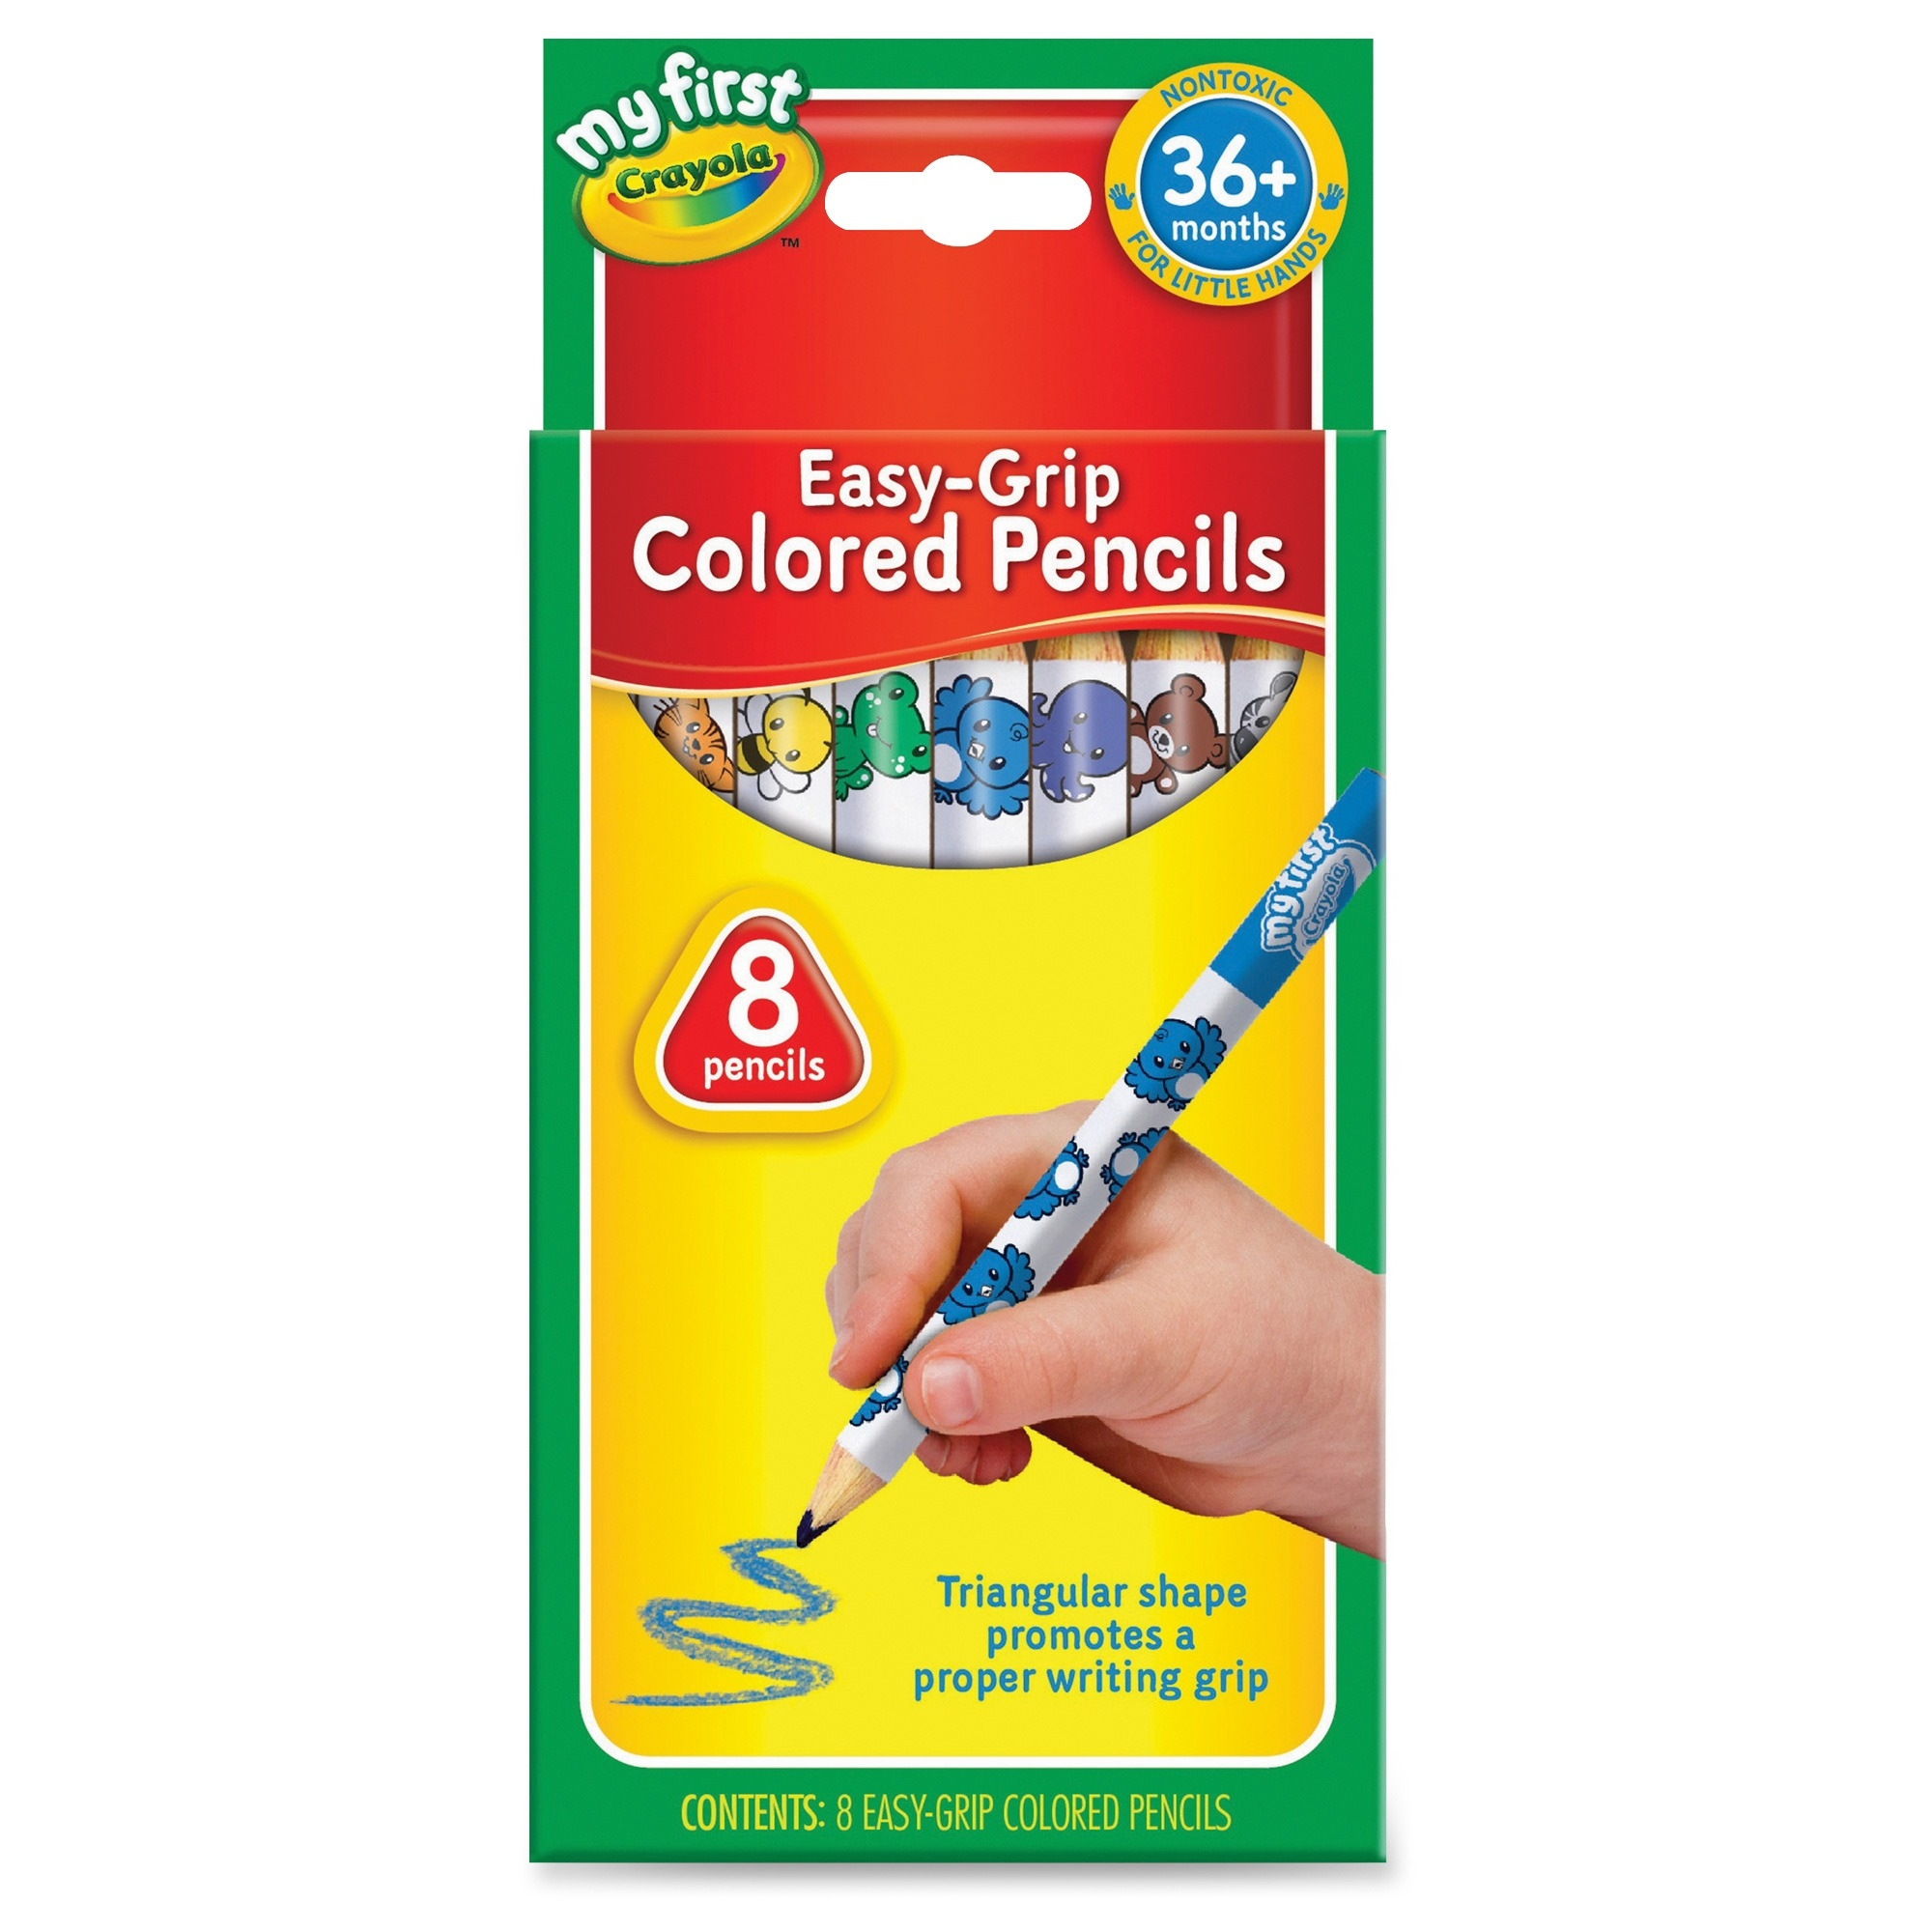 Crayola My First Easy-Grip Colored Pencils - Walmart.com